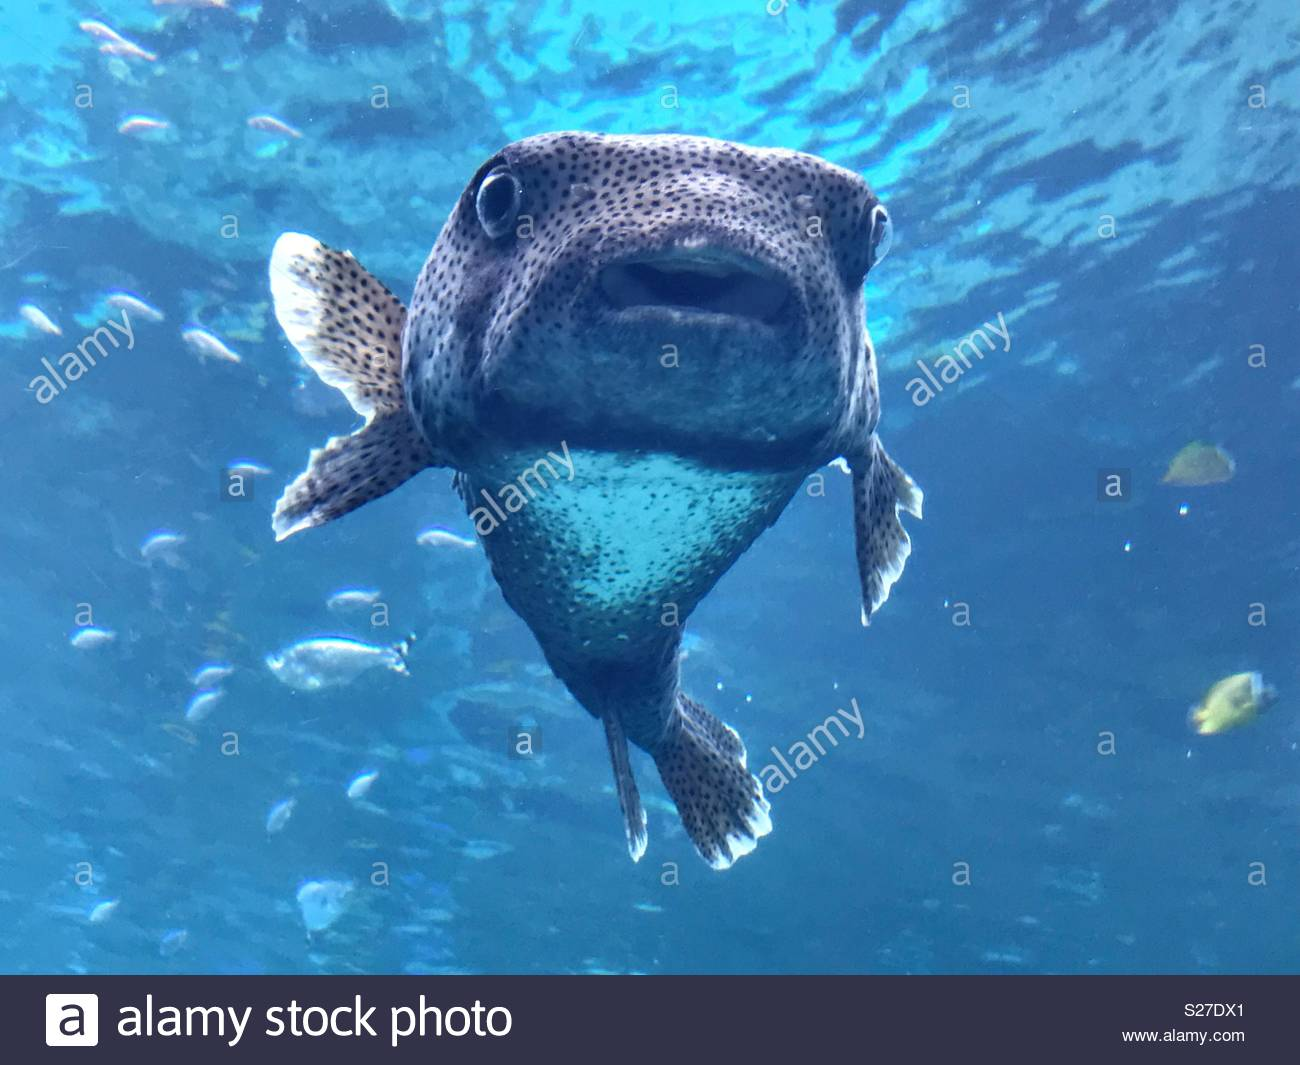 Puffer fish - Stock Image